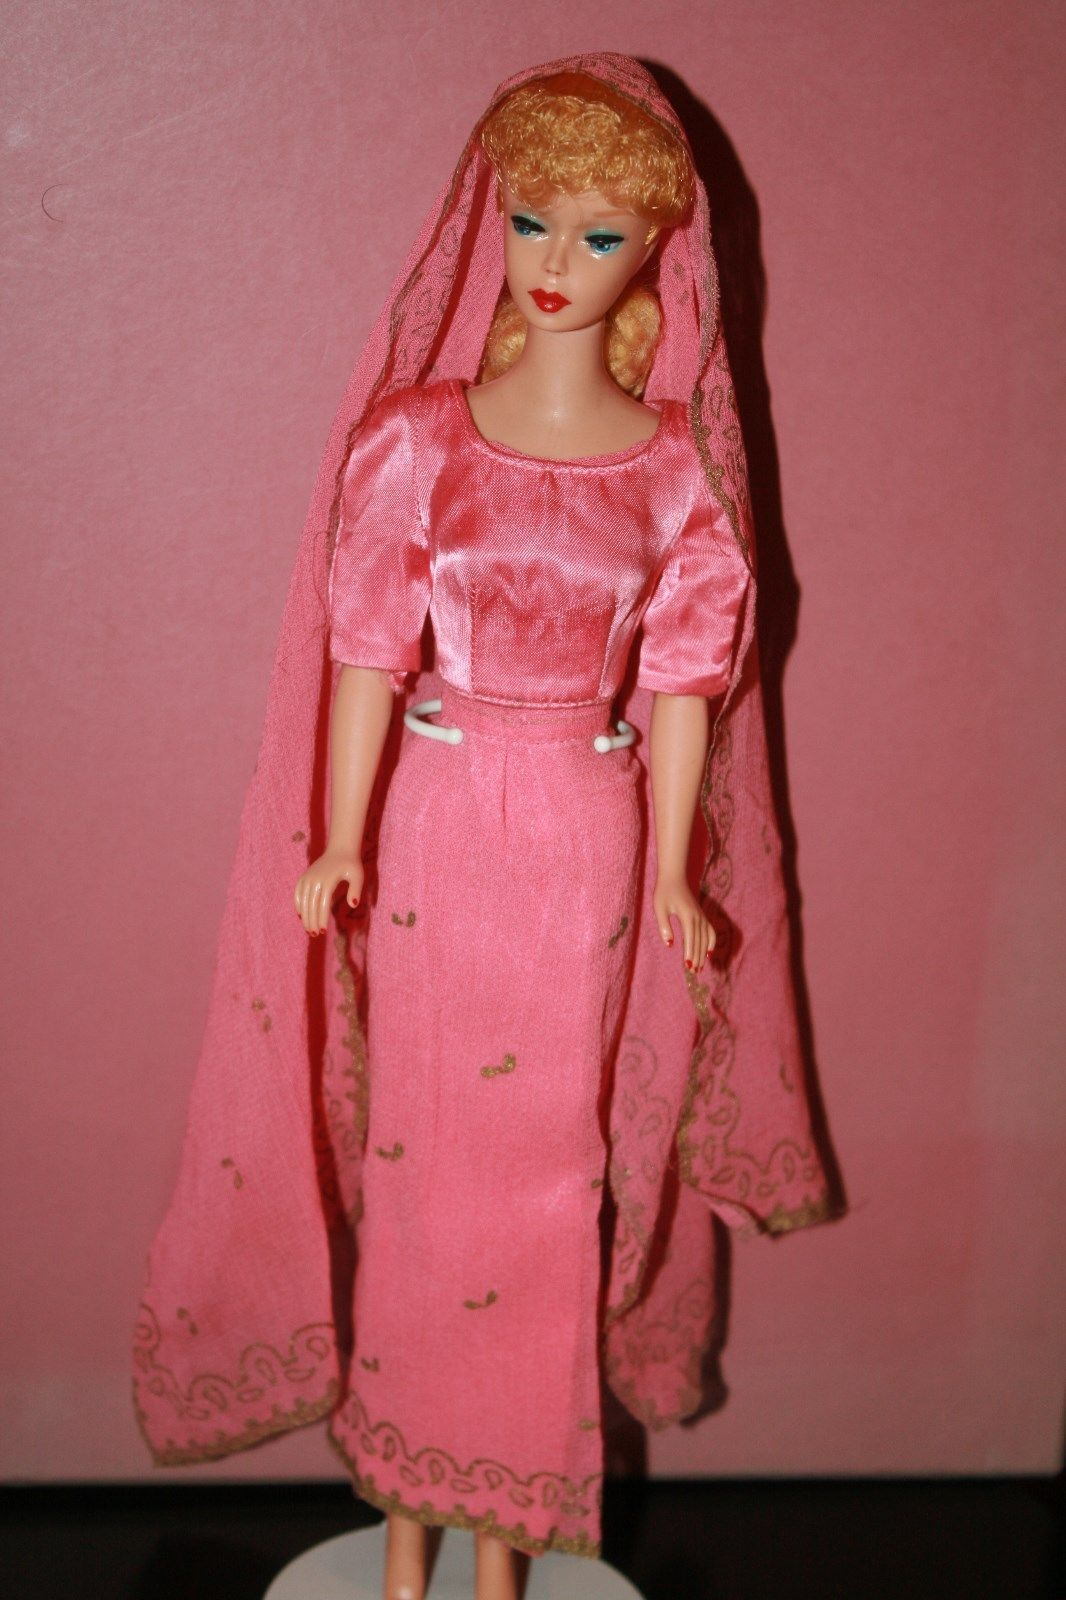 Vintage Barbie-Blonde PONYTAIL #5 Barbie #850 in Arabian Nights (Little Theatre) | eBay